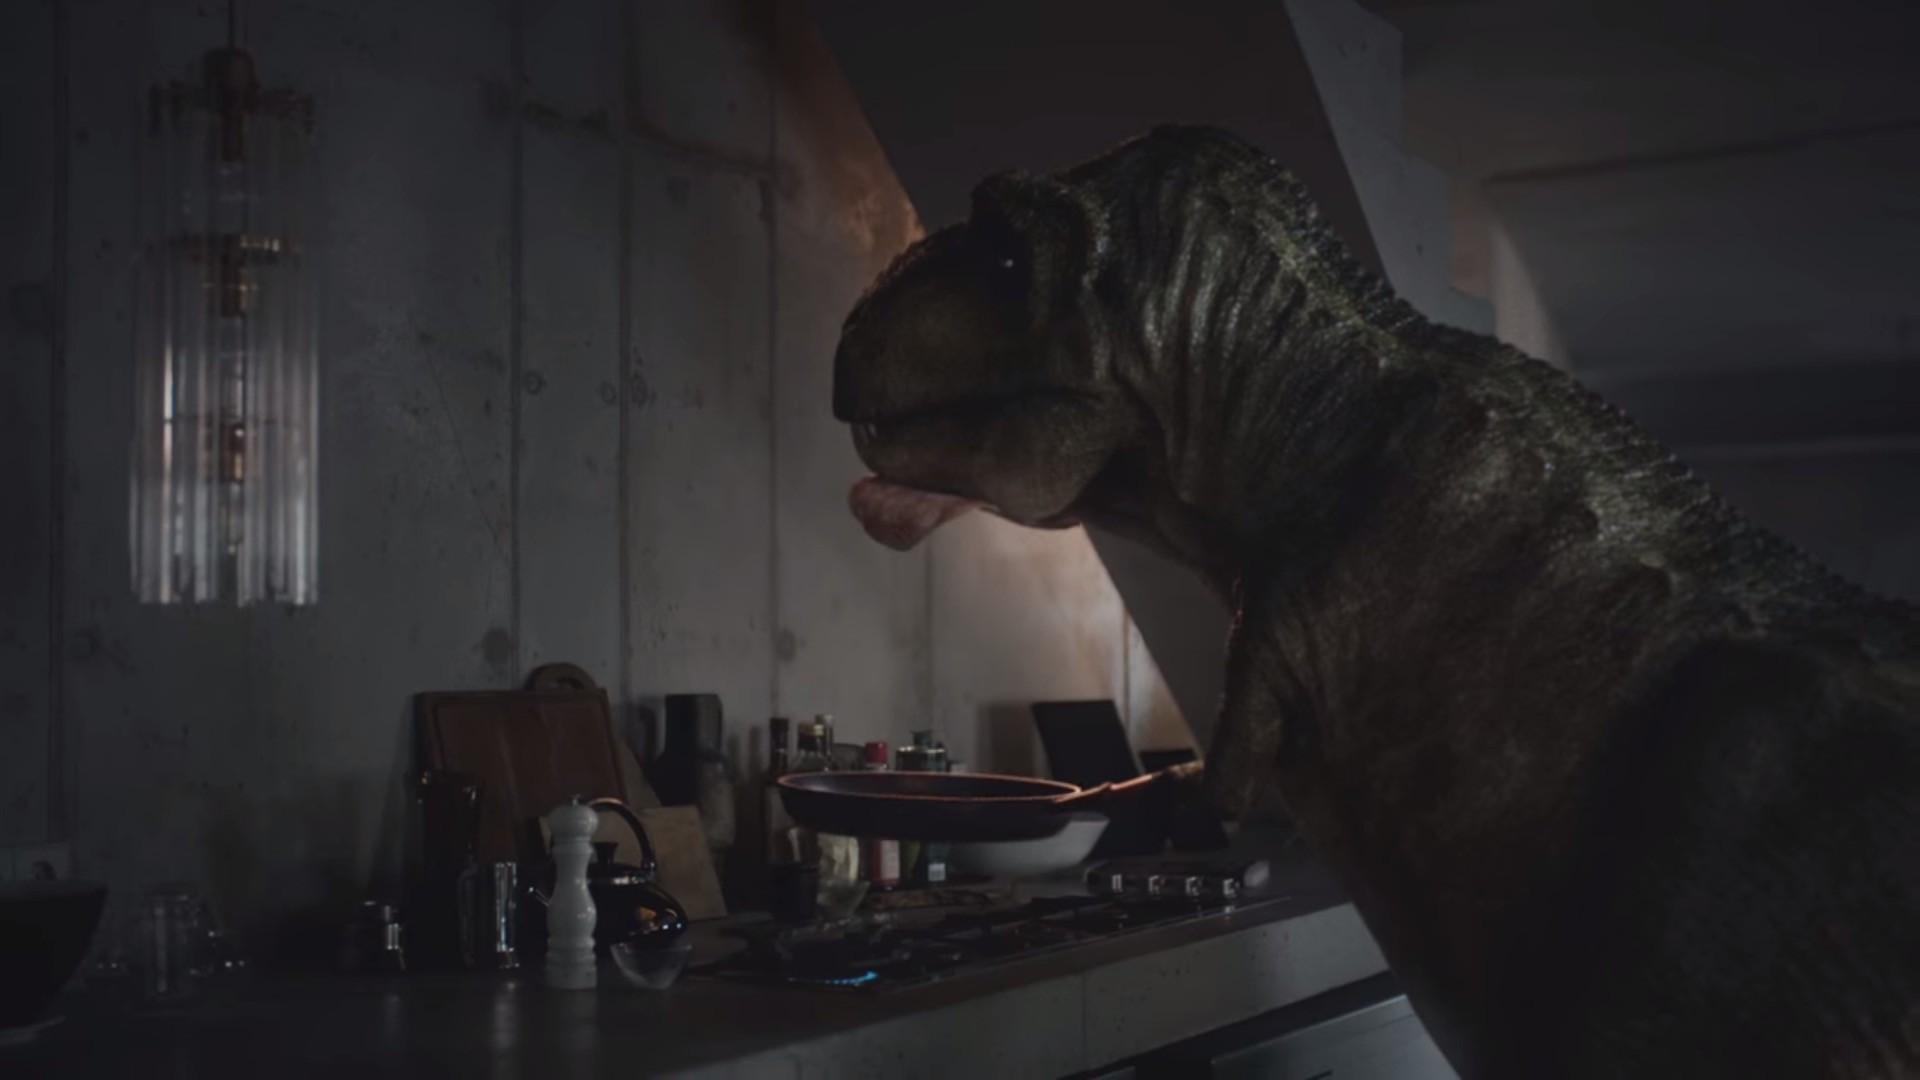 Audi T Rex Ad Is A Different Take On A Sad Internet Meme